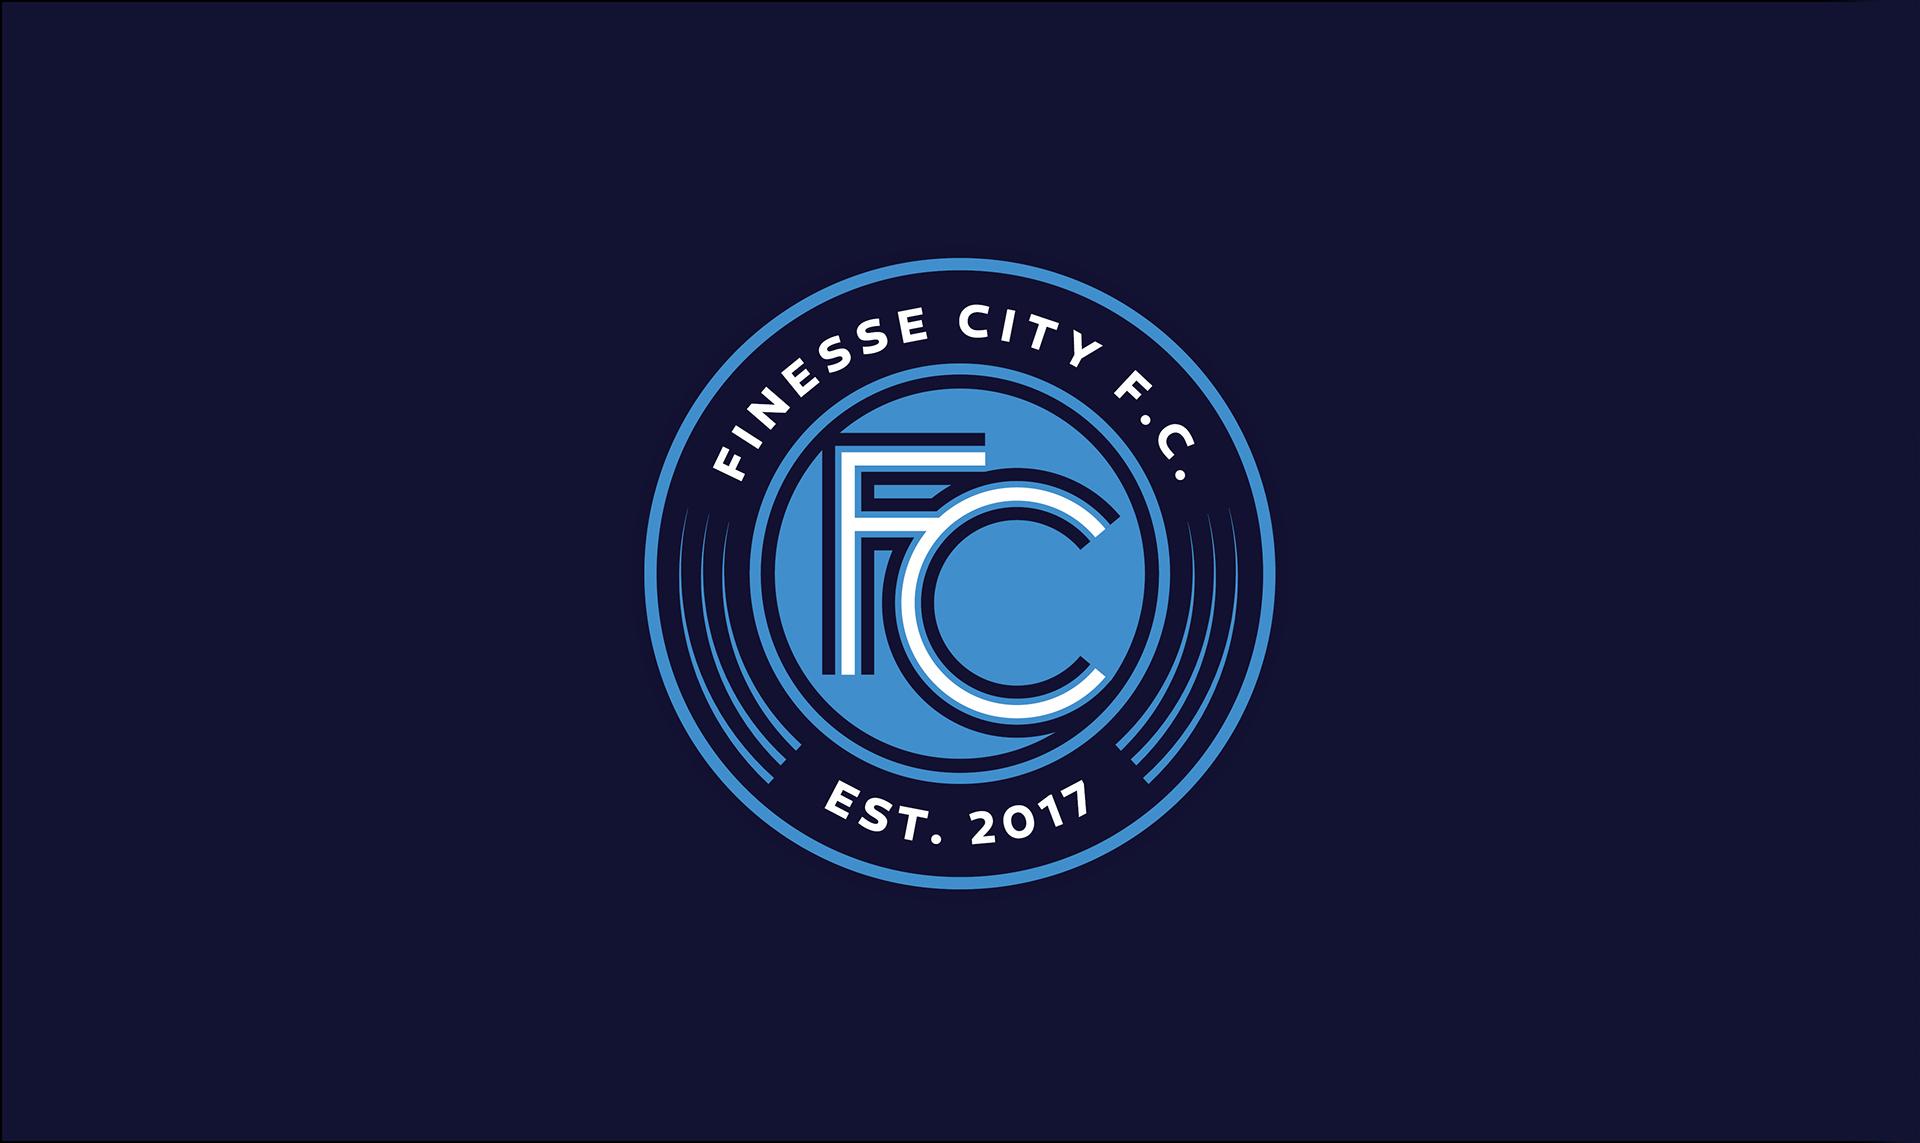 Nacione_Finesse City (8)